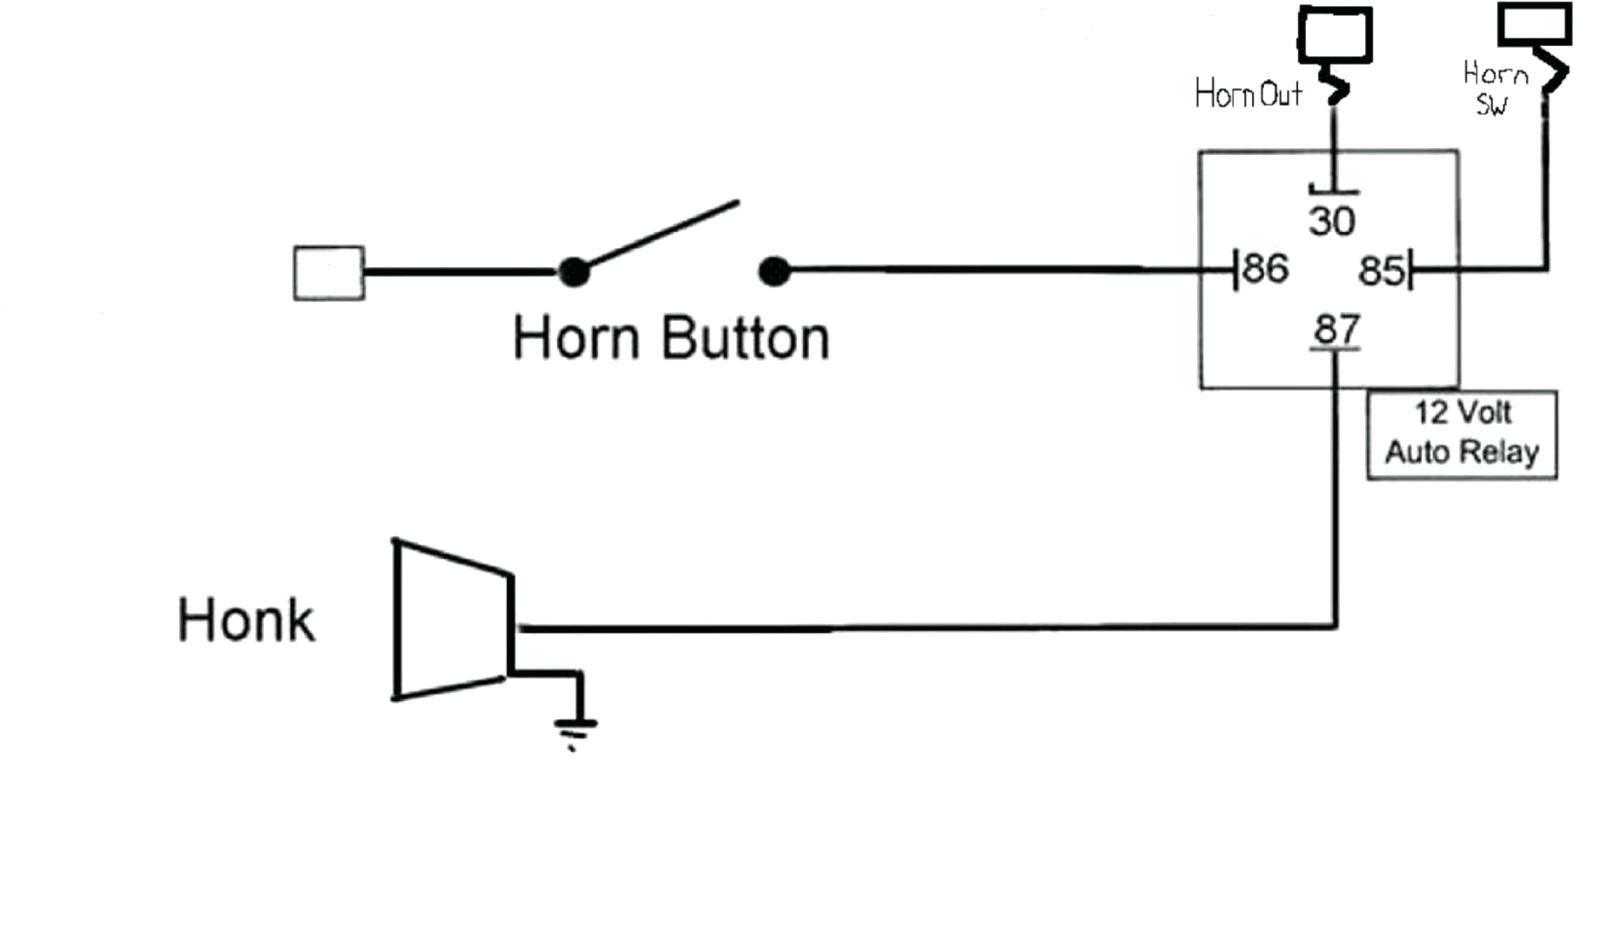 Automotive Horn Wiring